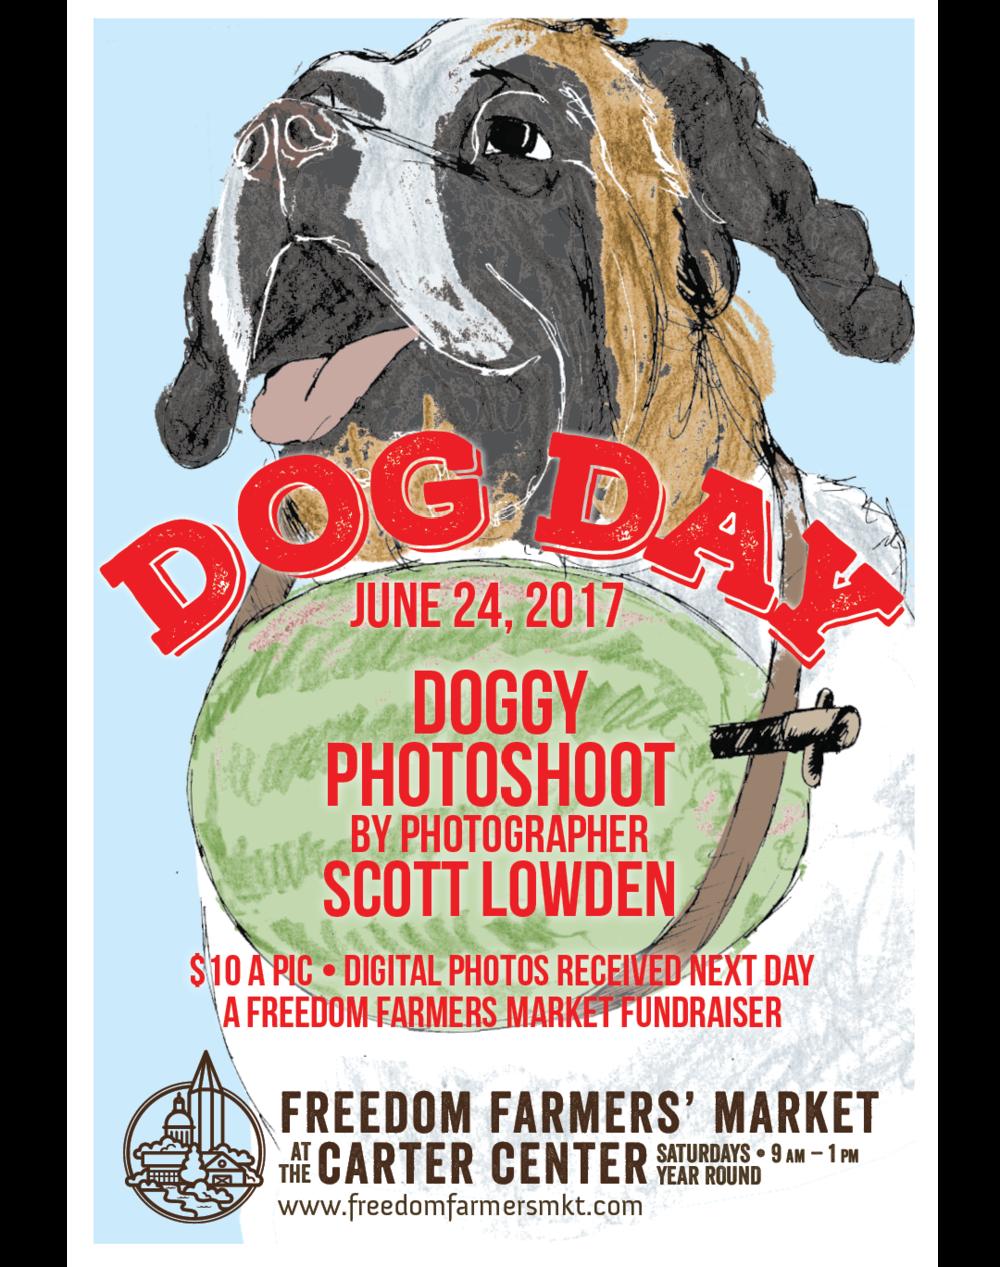 ffm-dogday-2017-01.png